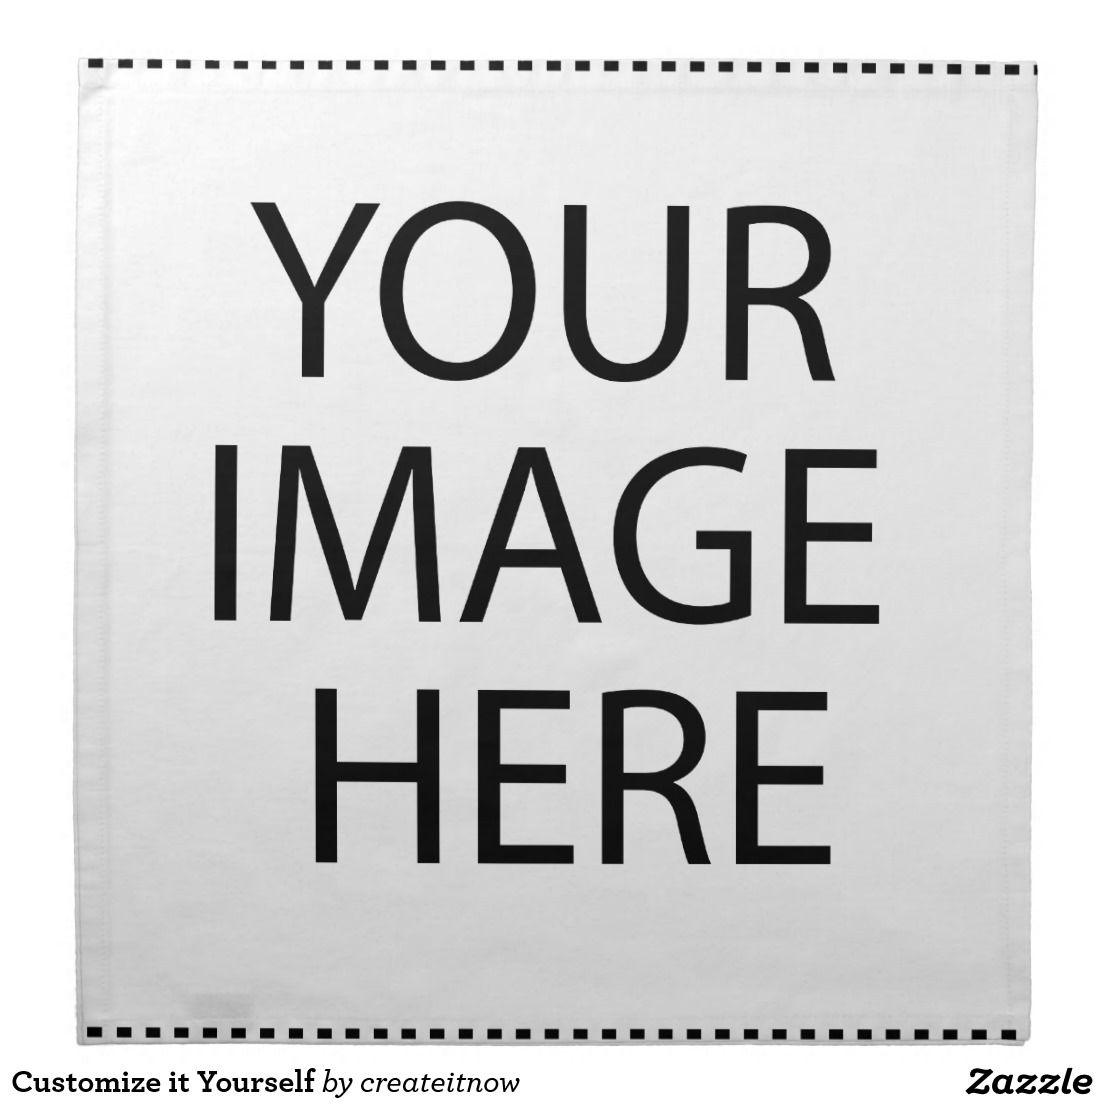 #Customize it Yourself #Clothnapkins #Napkins #Timsmanmal